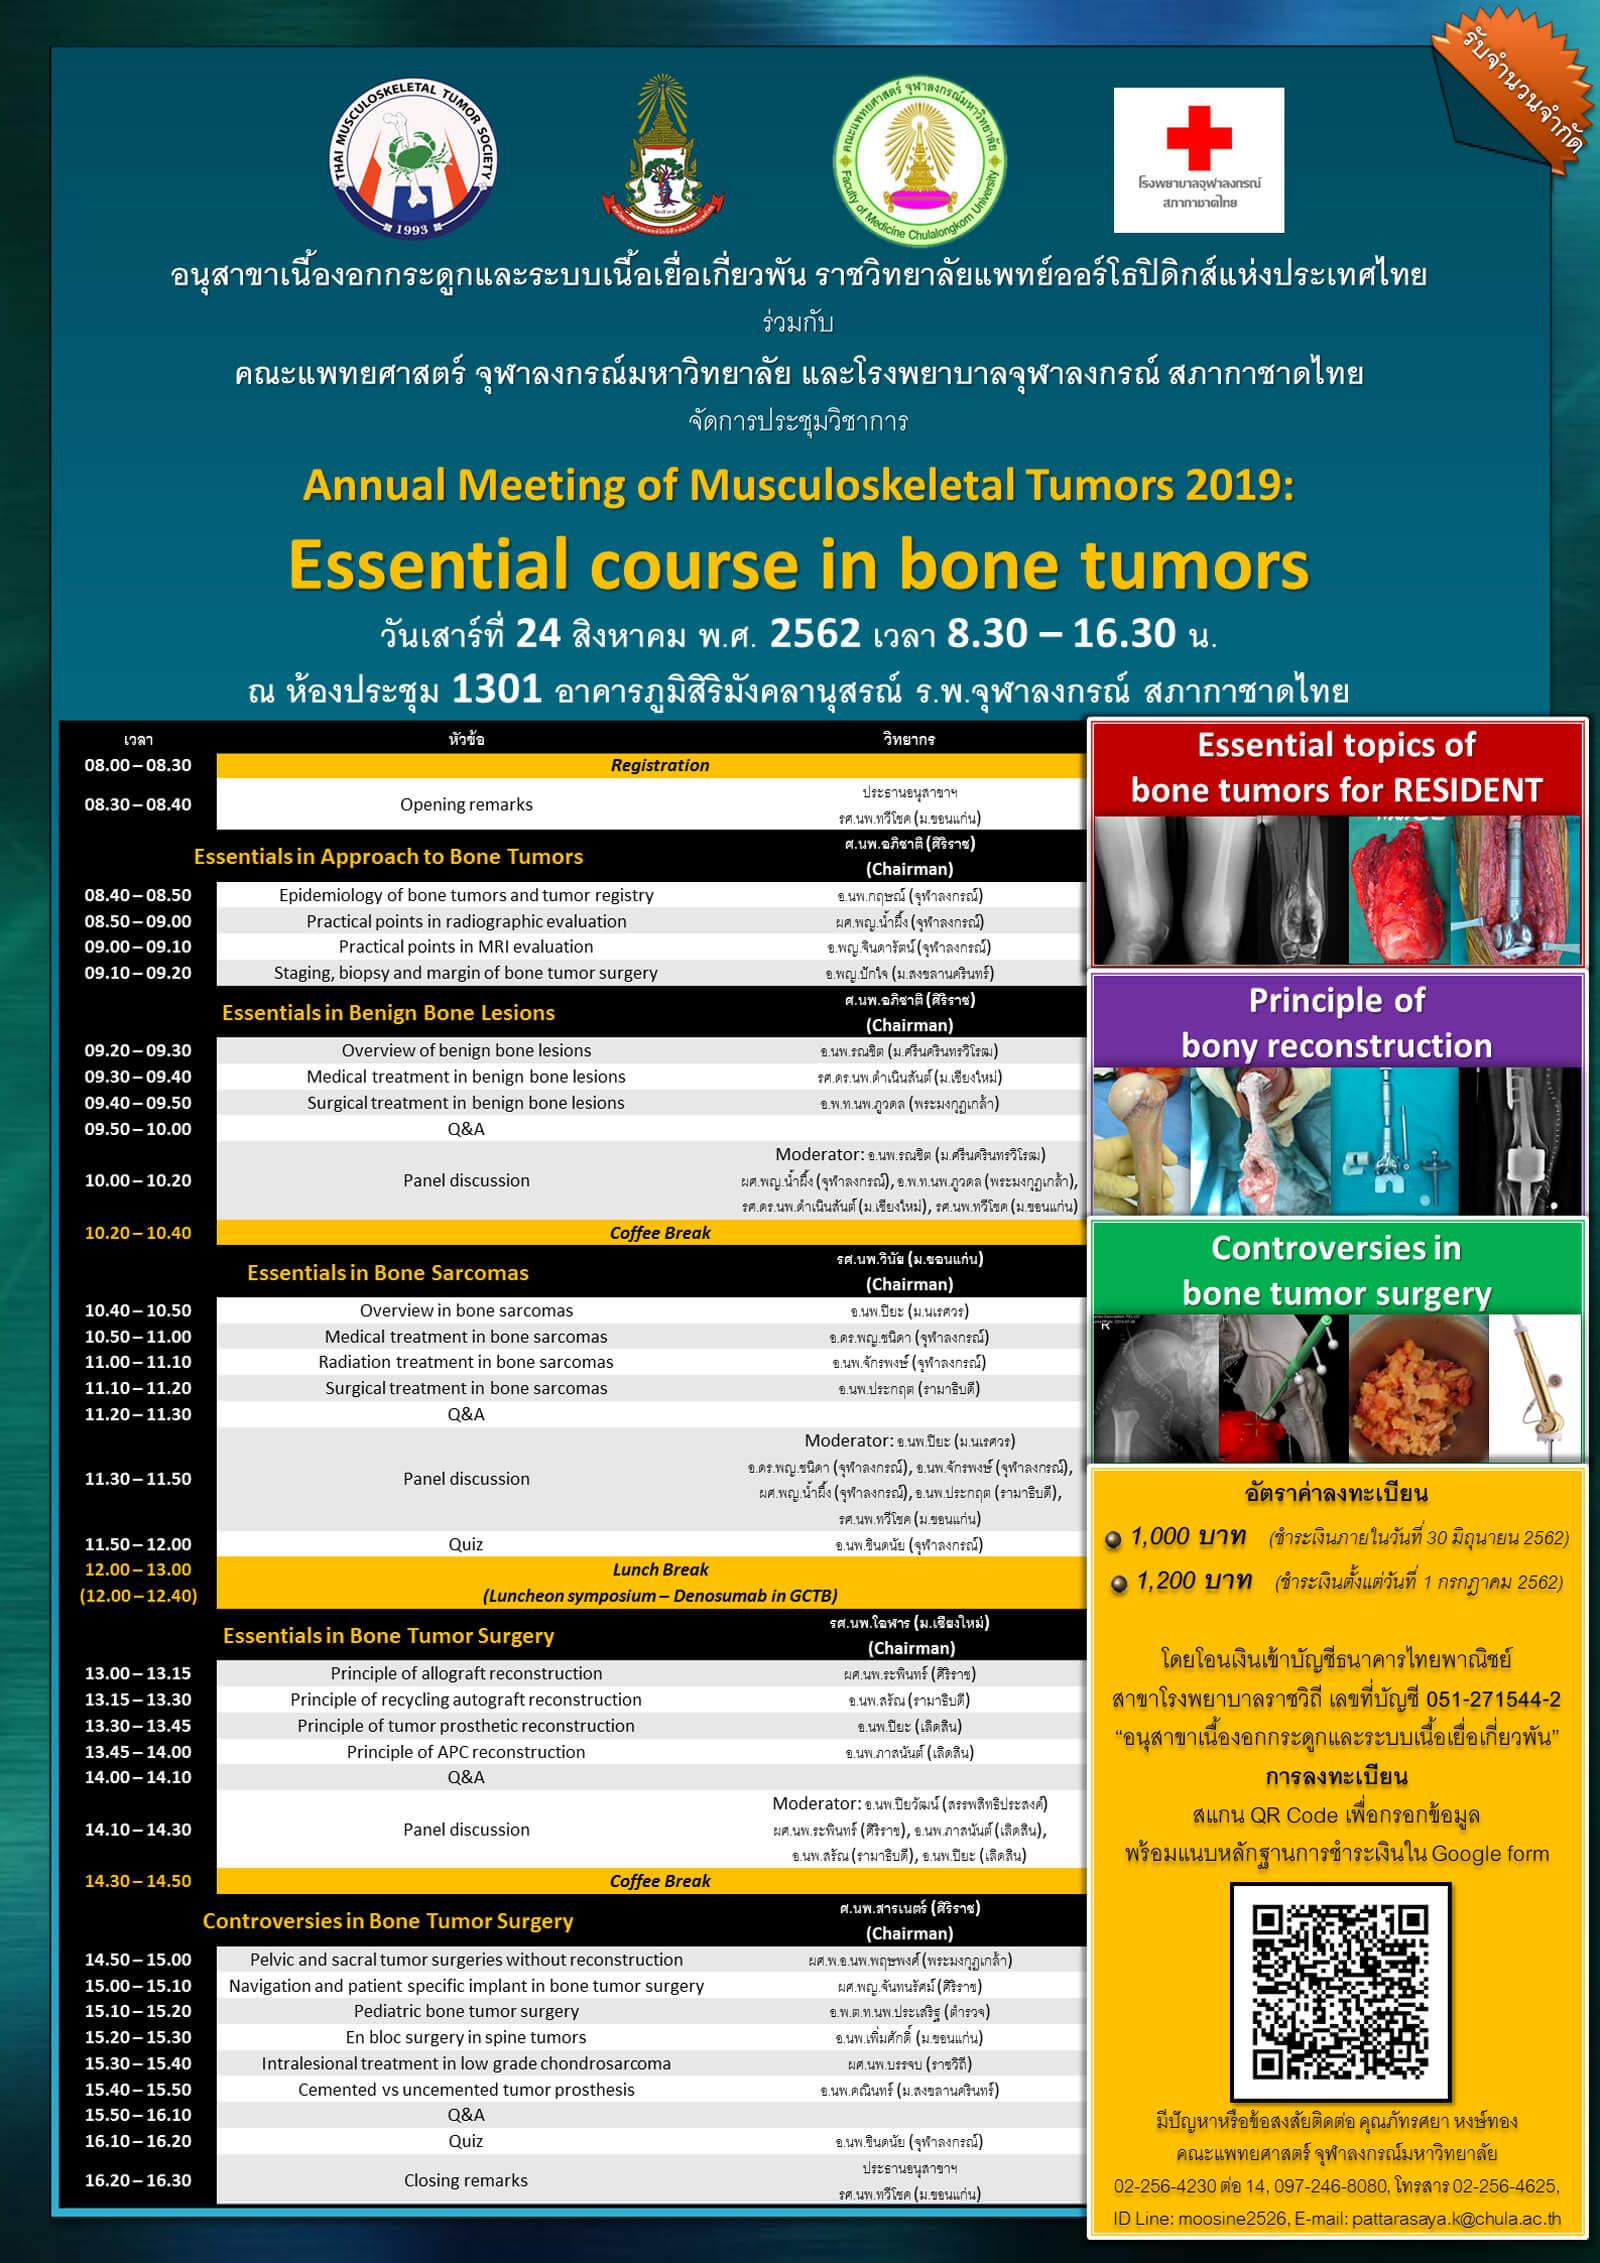 Annual Meeting of Musculoskeletal Tumor 2019: Essential course in bone tumors